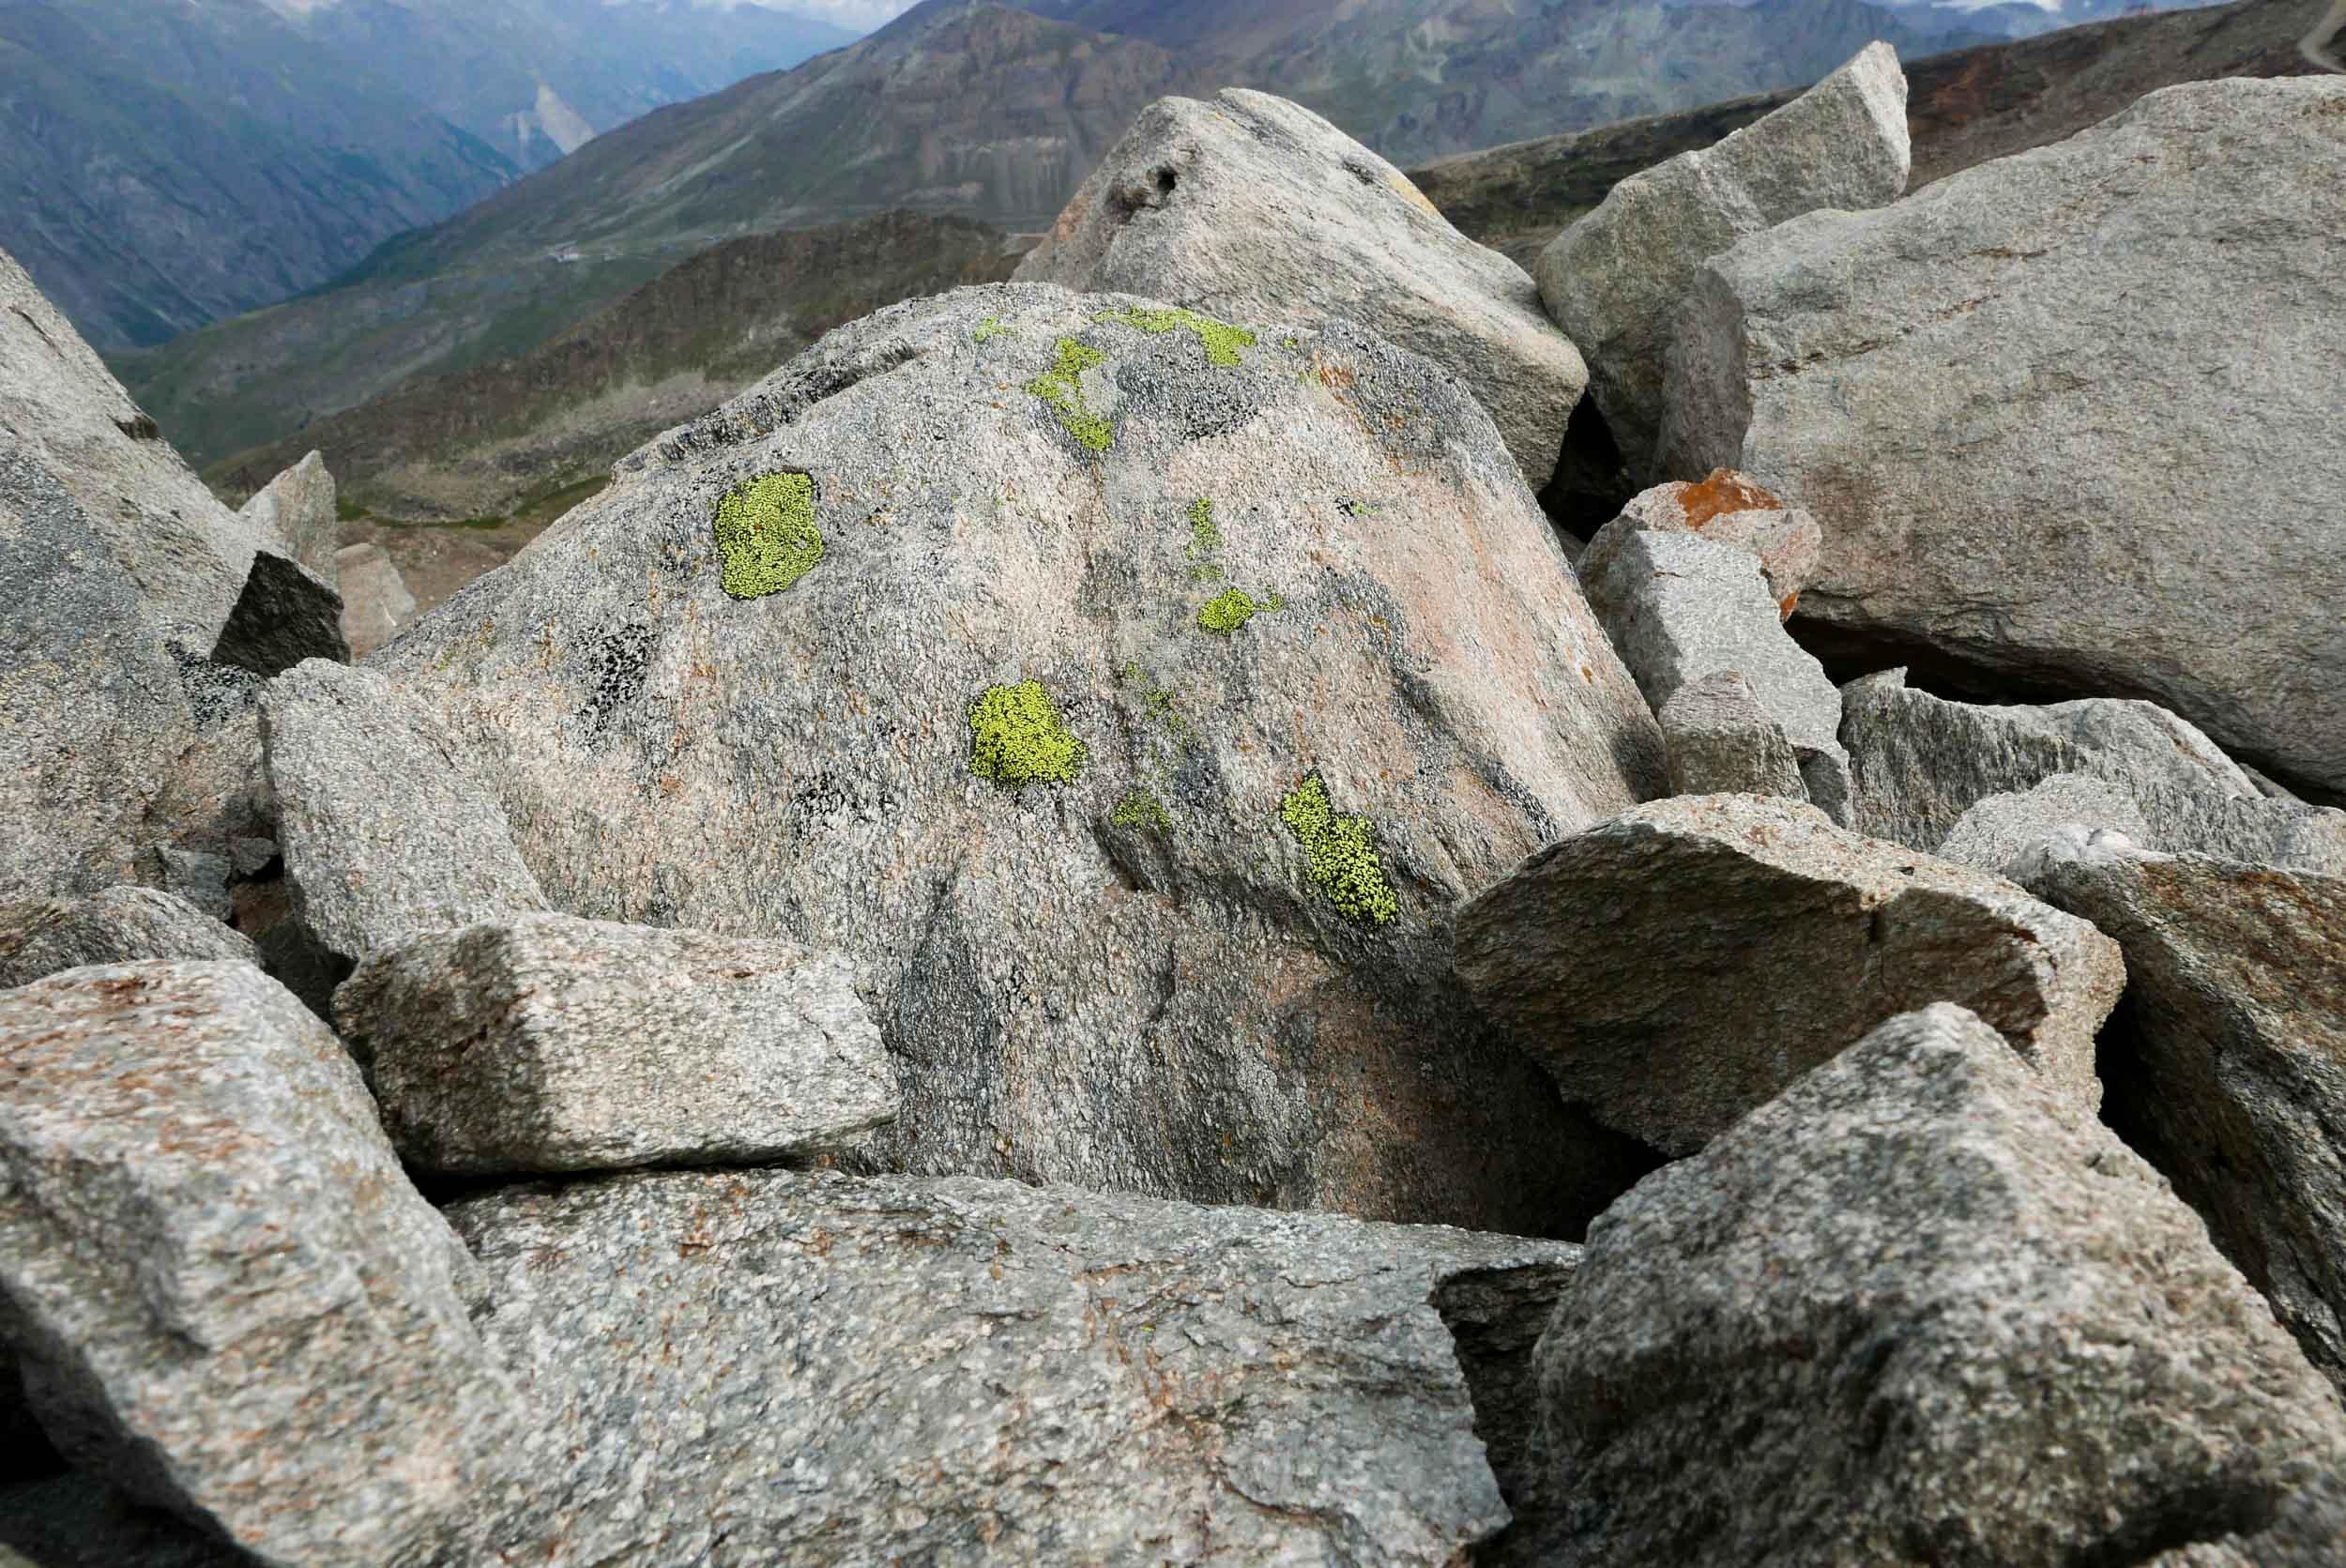 Du lichen rhizocarpon geographicum accroché à un rocher.